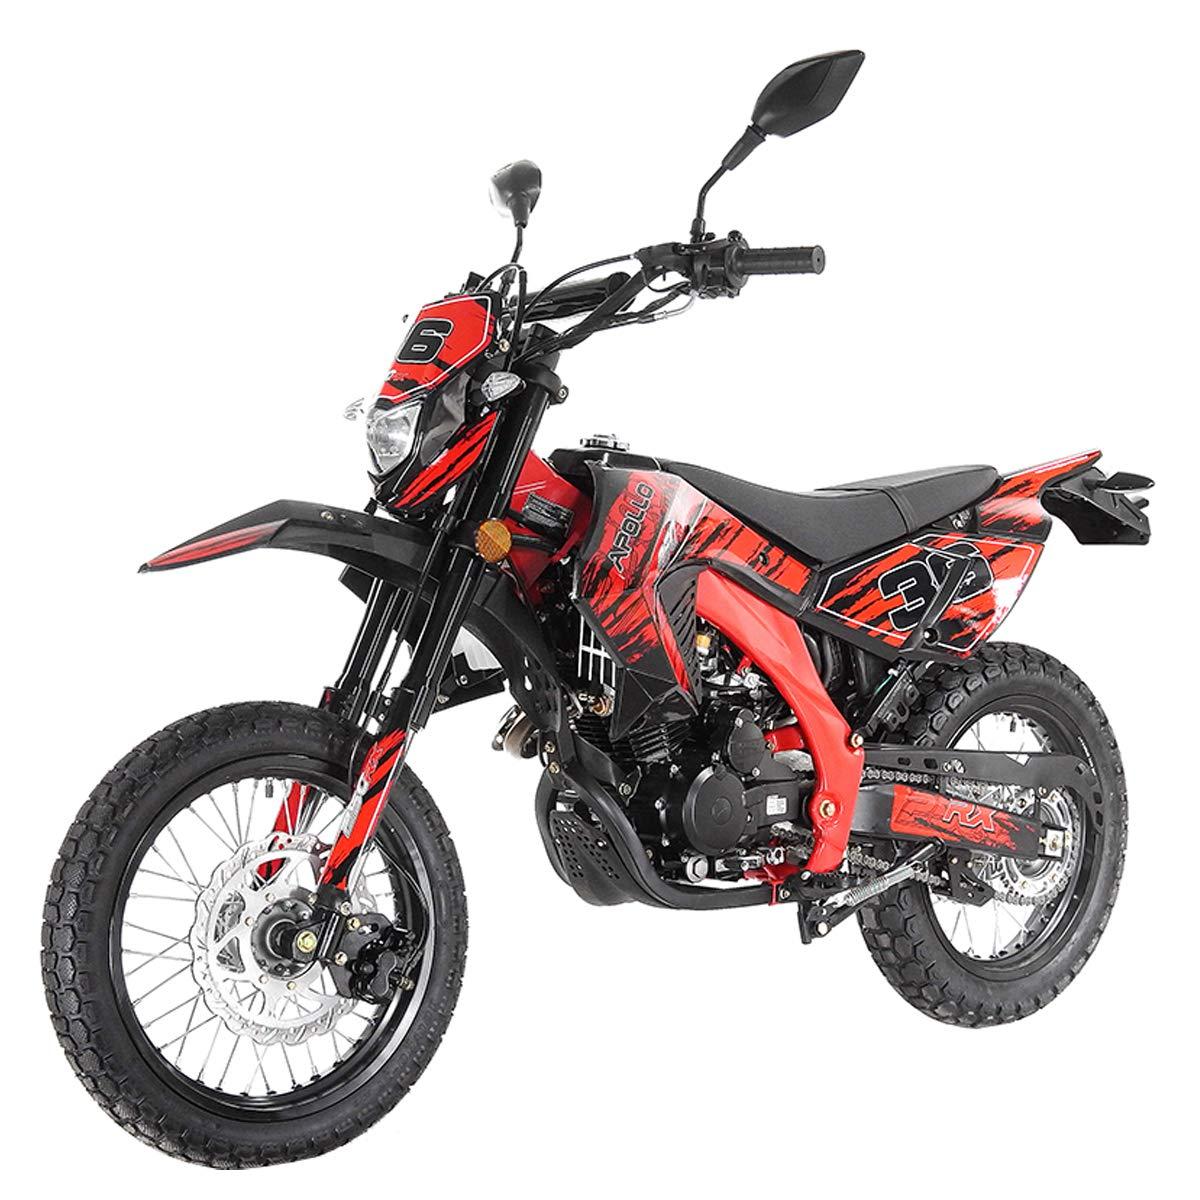 X-Pro 250cc Dirt Bike Pit Bike Gas Dirt Bikes Adult Dirt Pitbike 250cc Deluxe DOT Street Legal Dirt Pit Bike